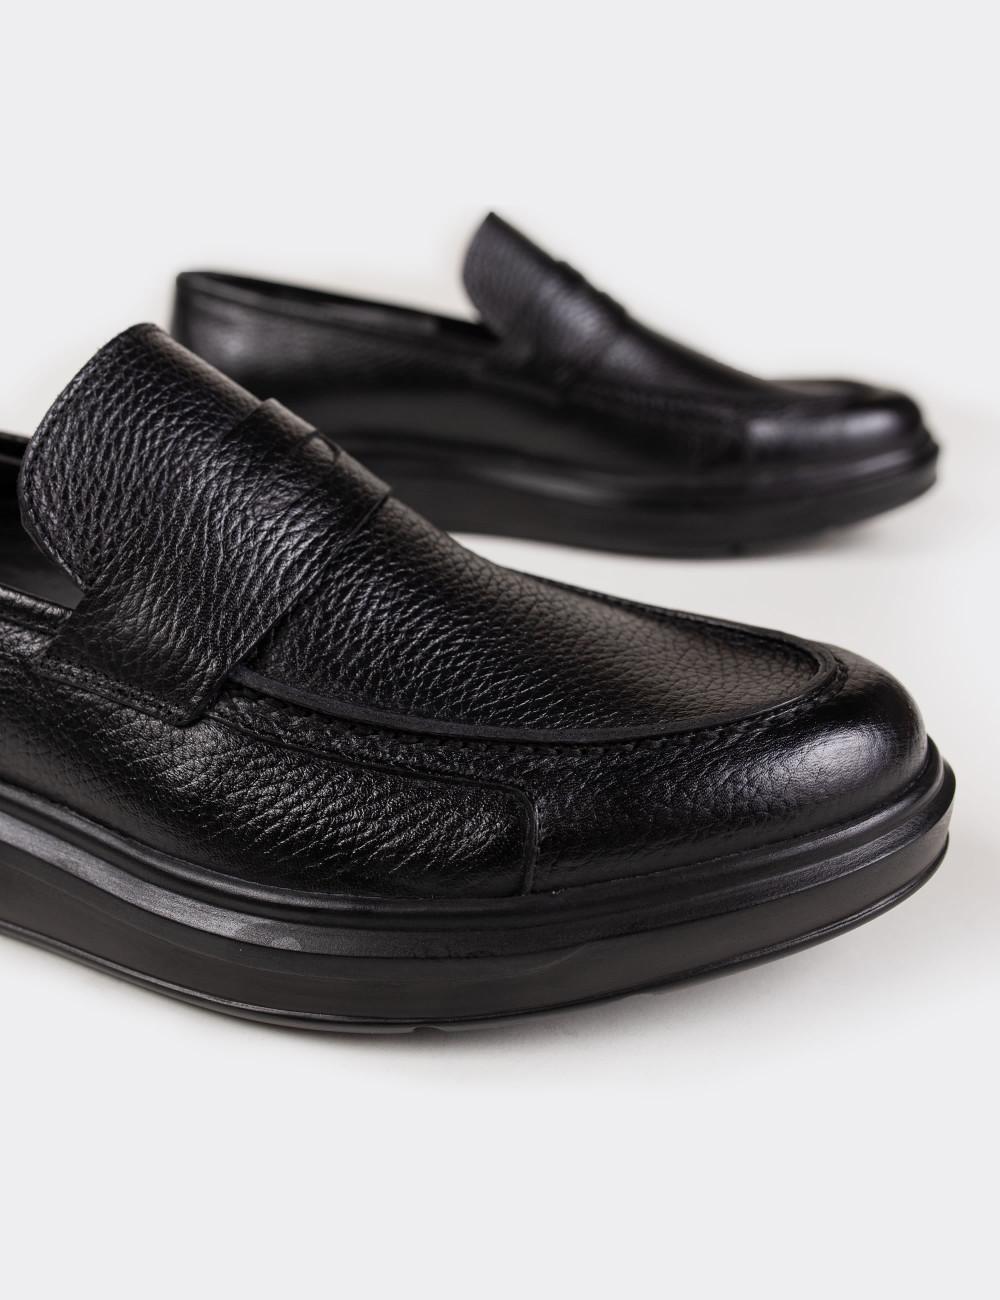 Hakiki Deri Siyah Comfort Loafer Erkek Ayakkabı - 01564MSYHP05